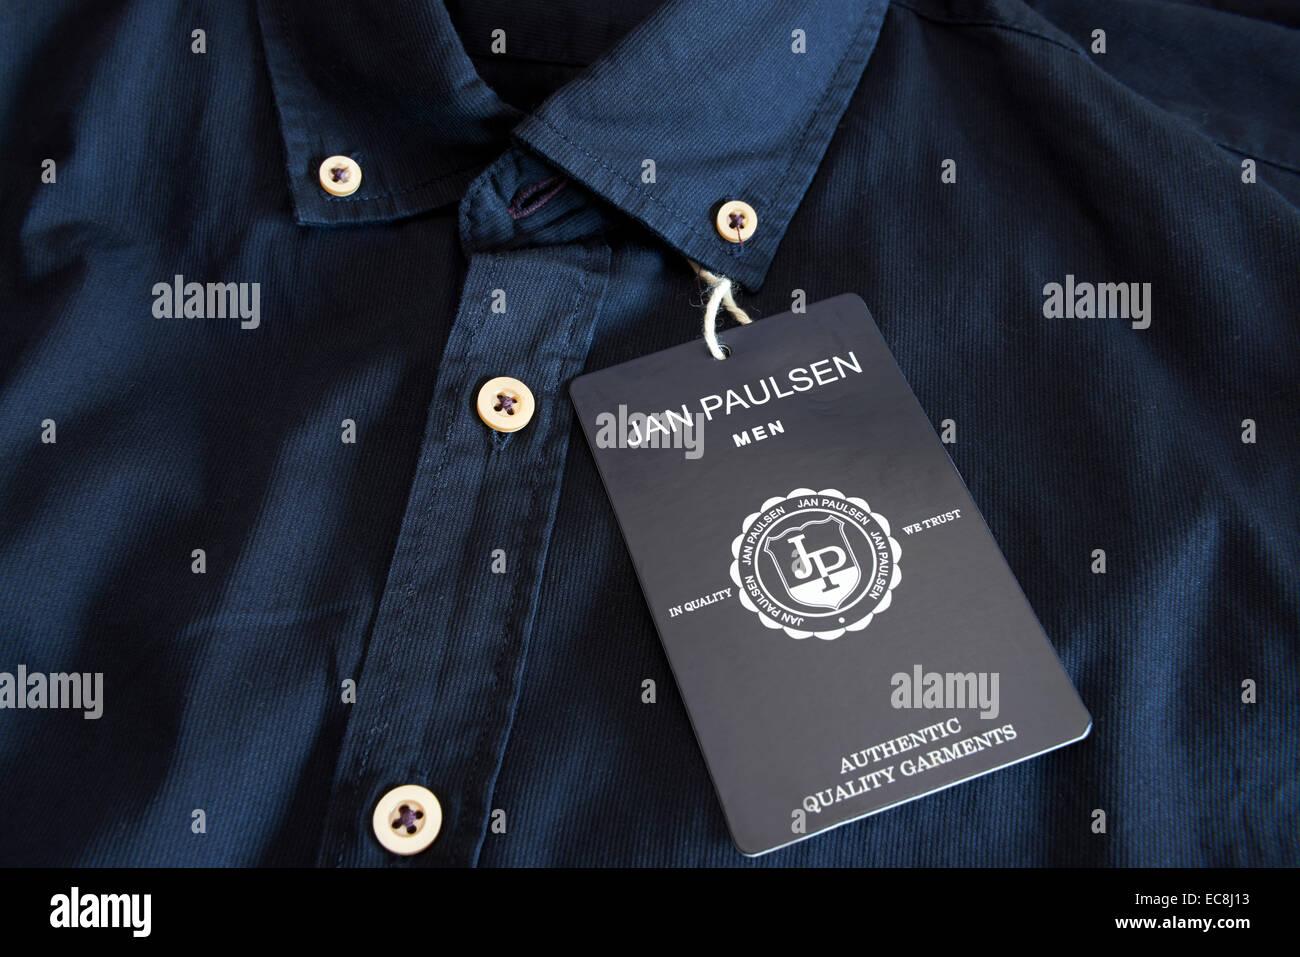 Jan Paulsen mens shirt - Stock Image